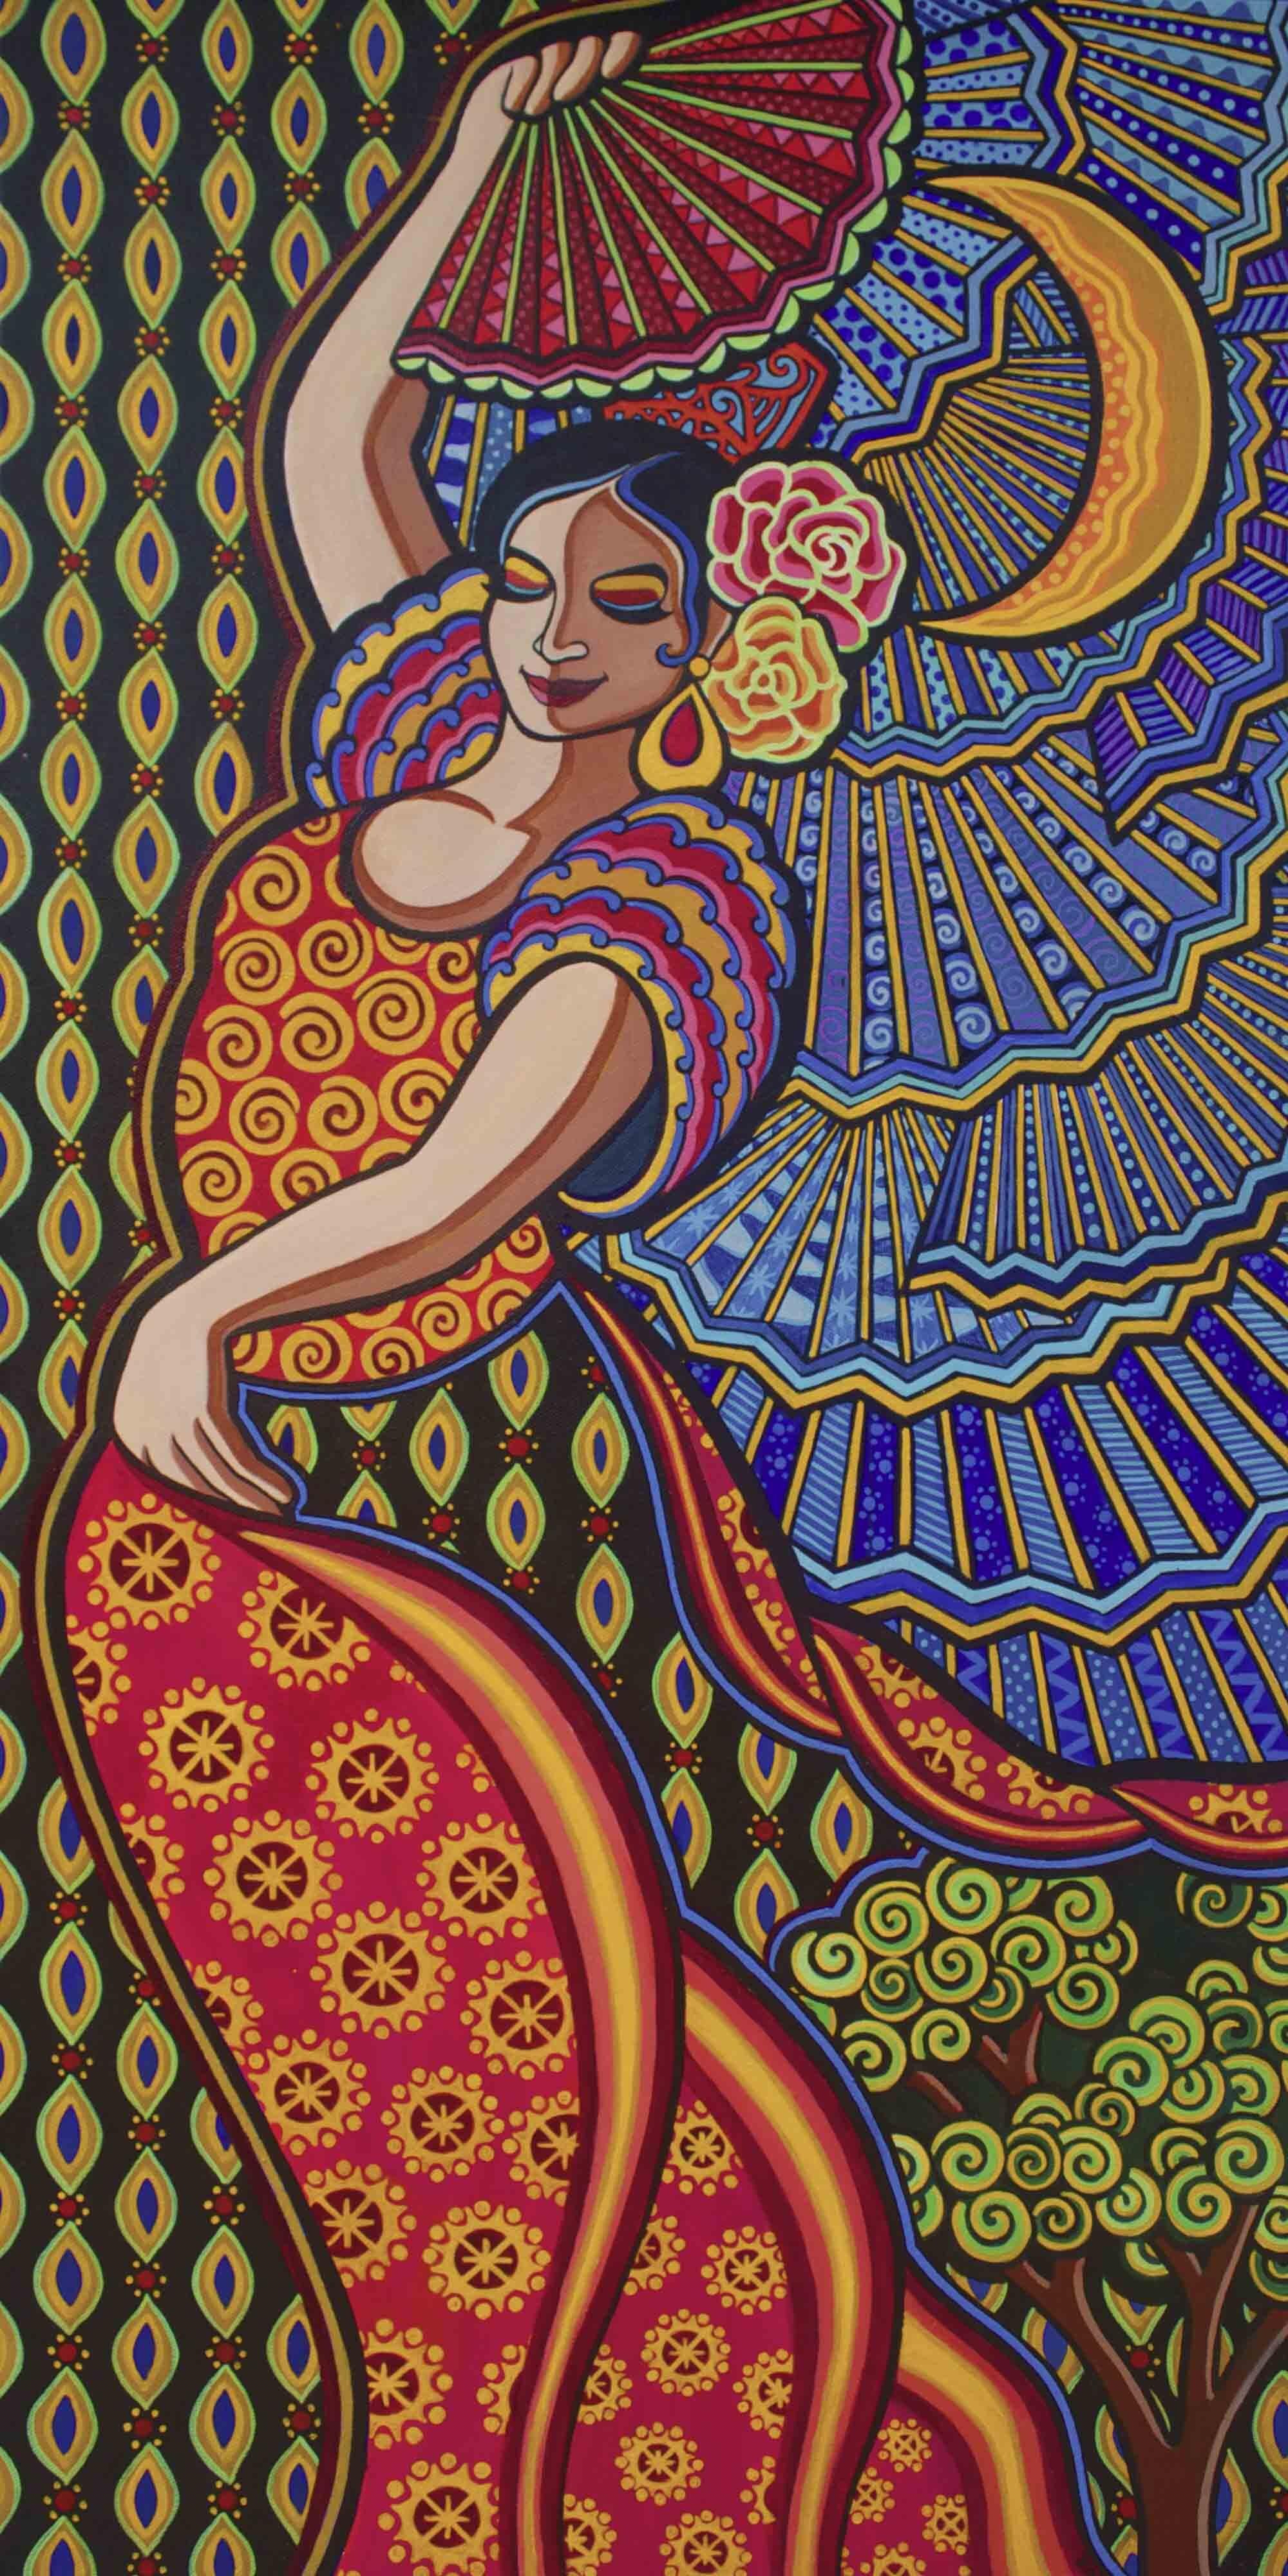 """Flamenco by Night"" 36"" x 18"" acrylic painting"